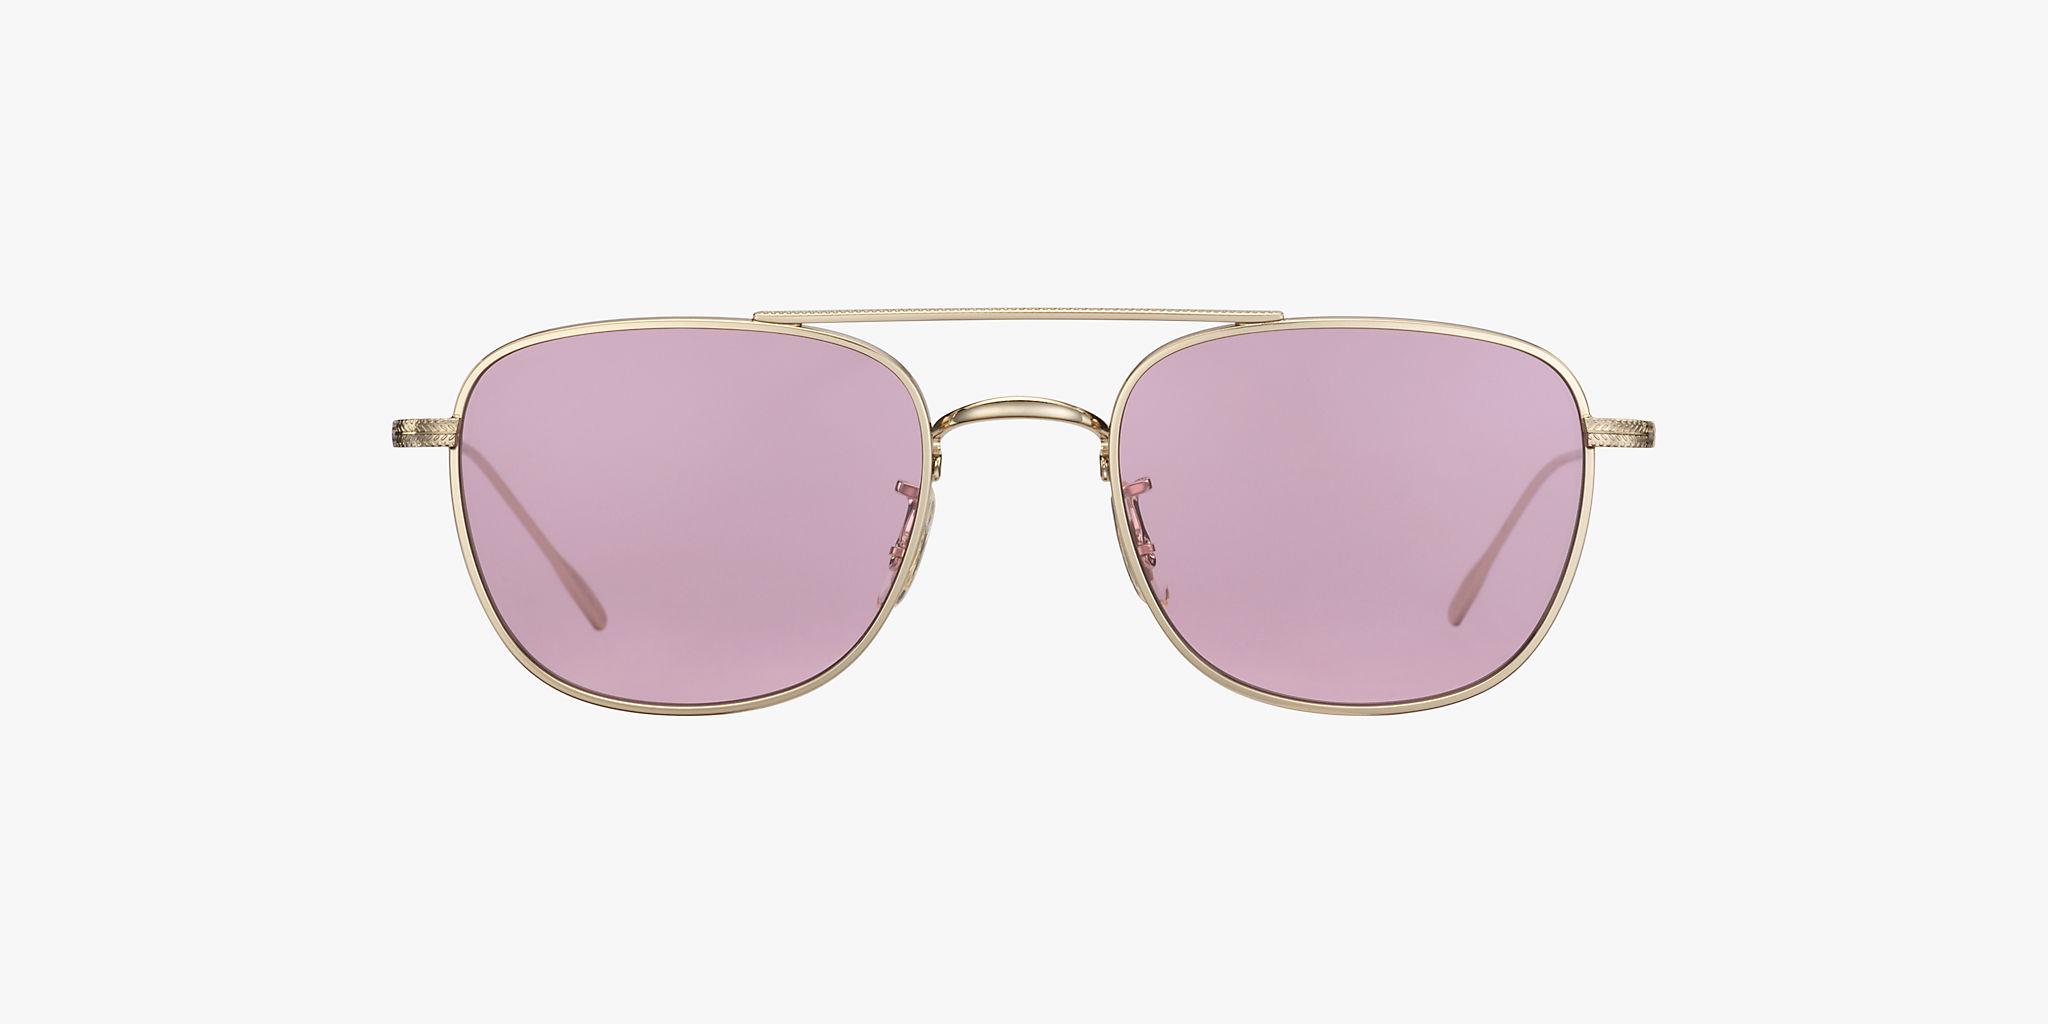 80931b87631ef Optical OV1238 - Gold - Pink Wash - Metal